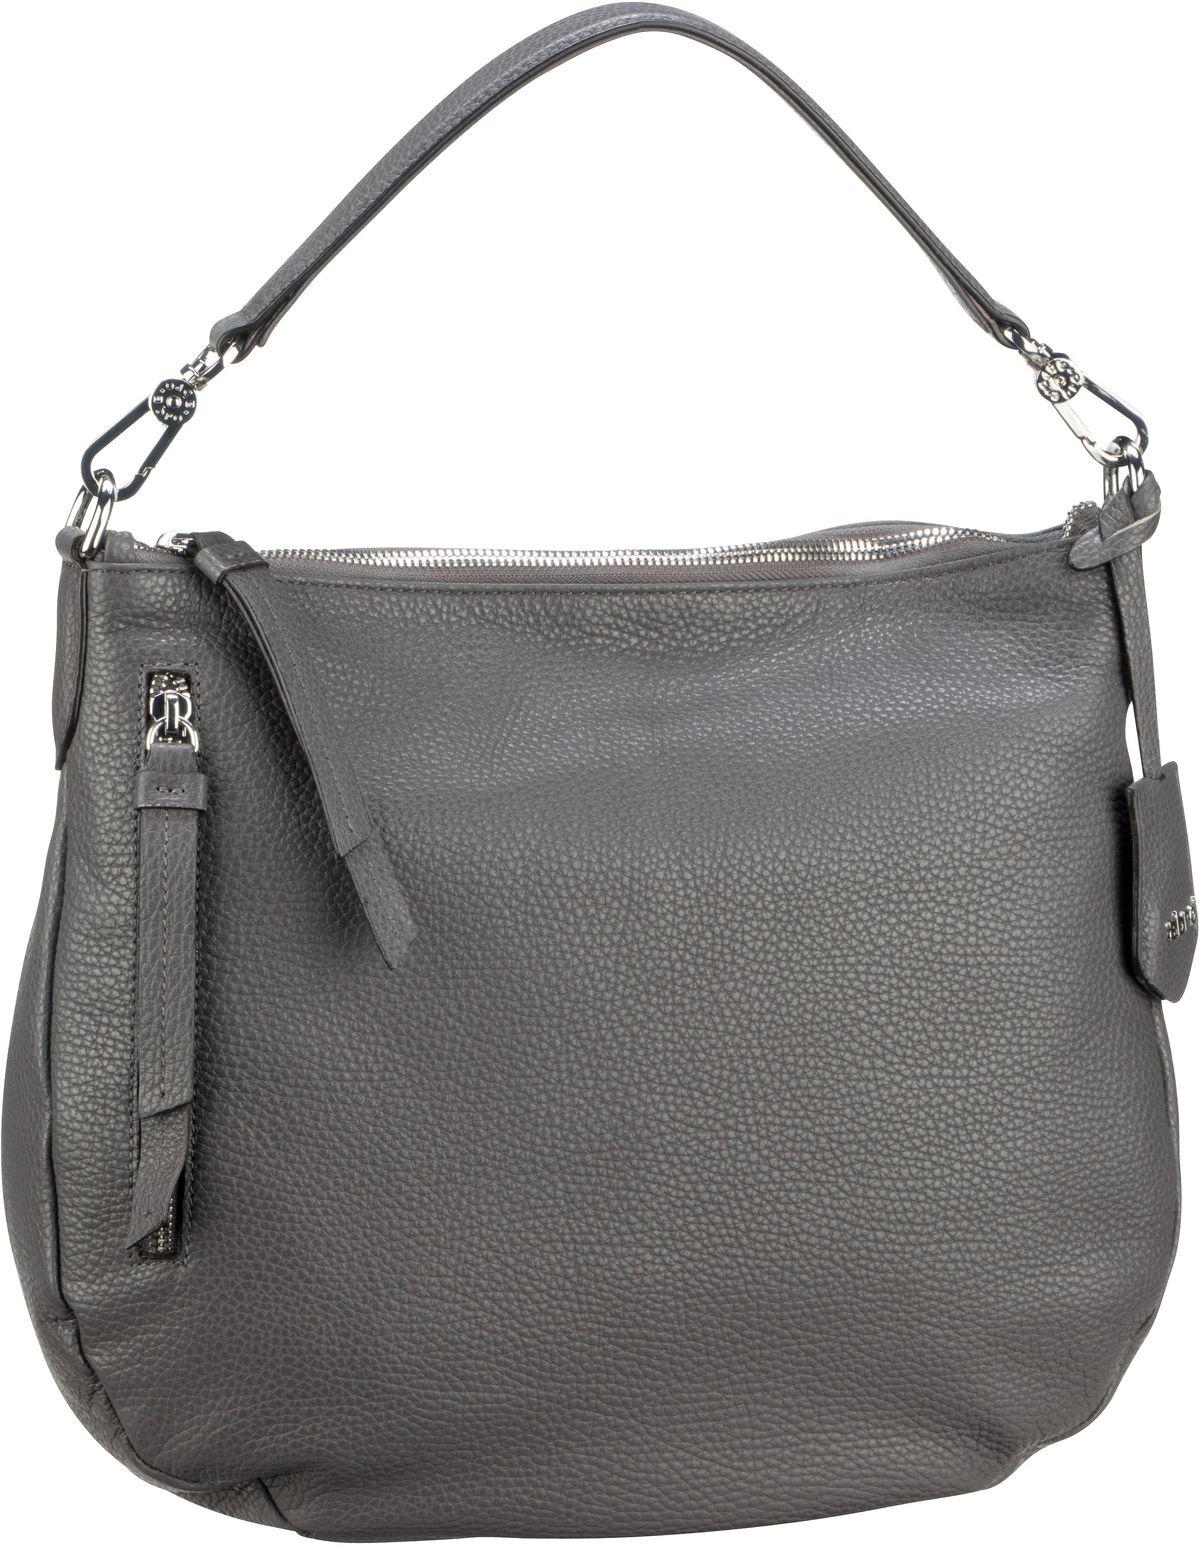 Handtasche Calf Adria 28623 Dark Grey